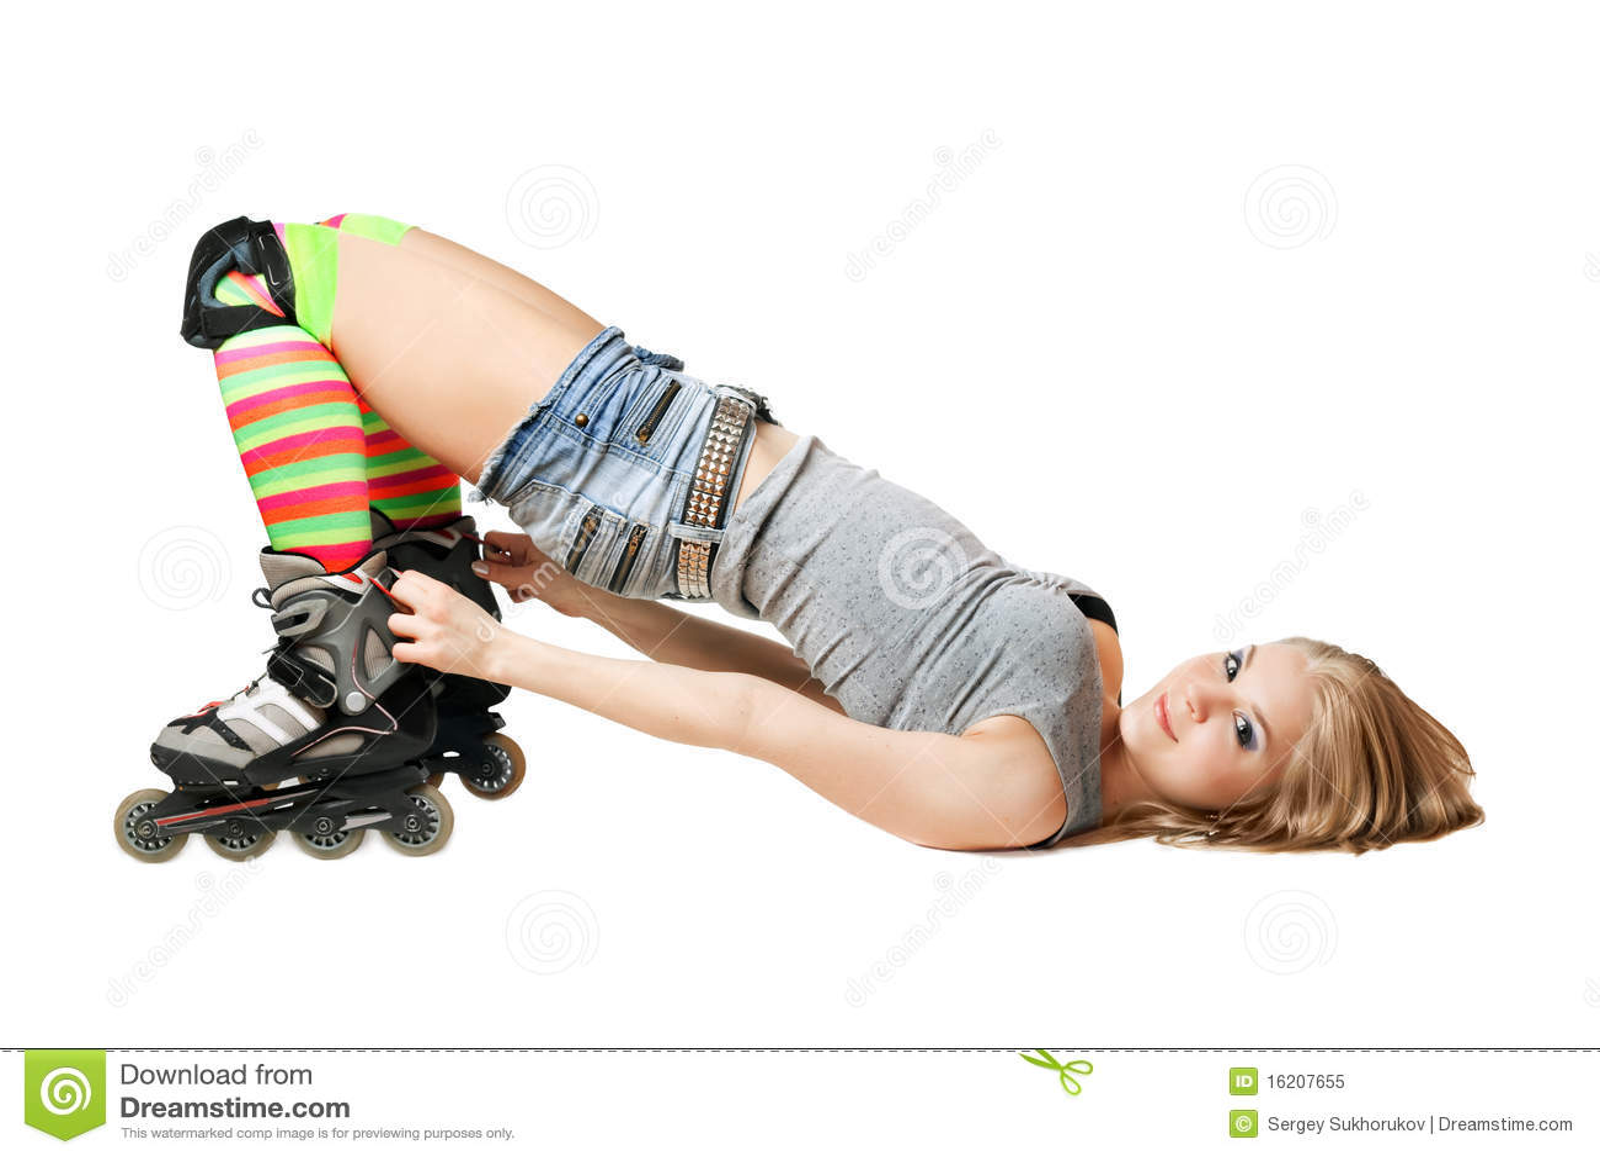 Roller skates for free - Lying Pretty Girl In Roller Skates Royalty Free Stock Photo